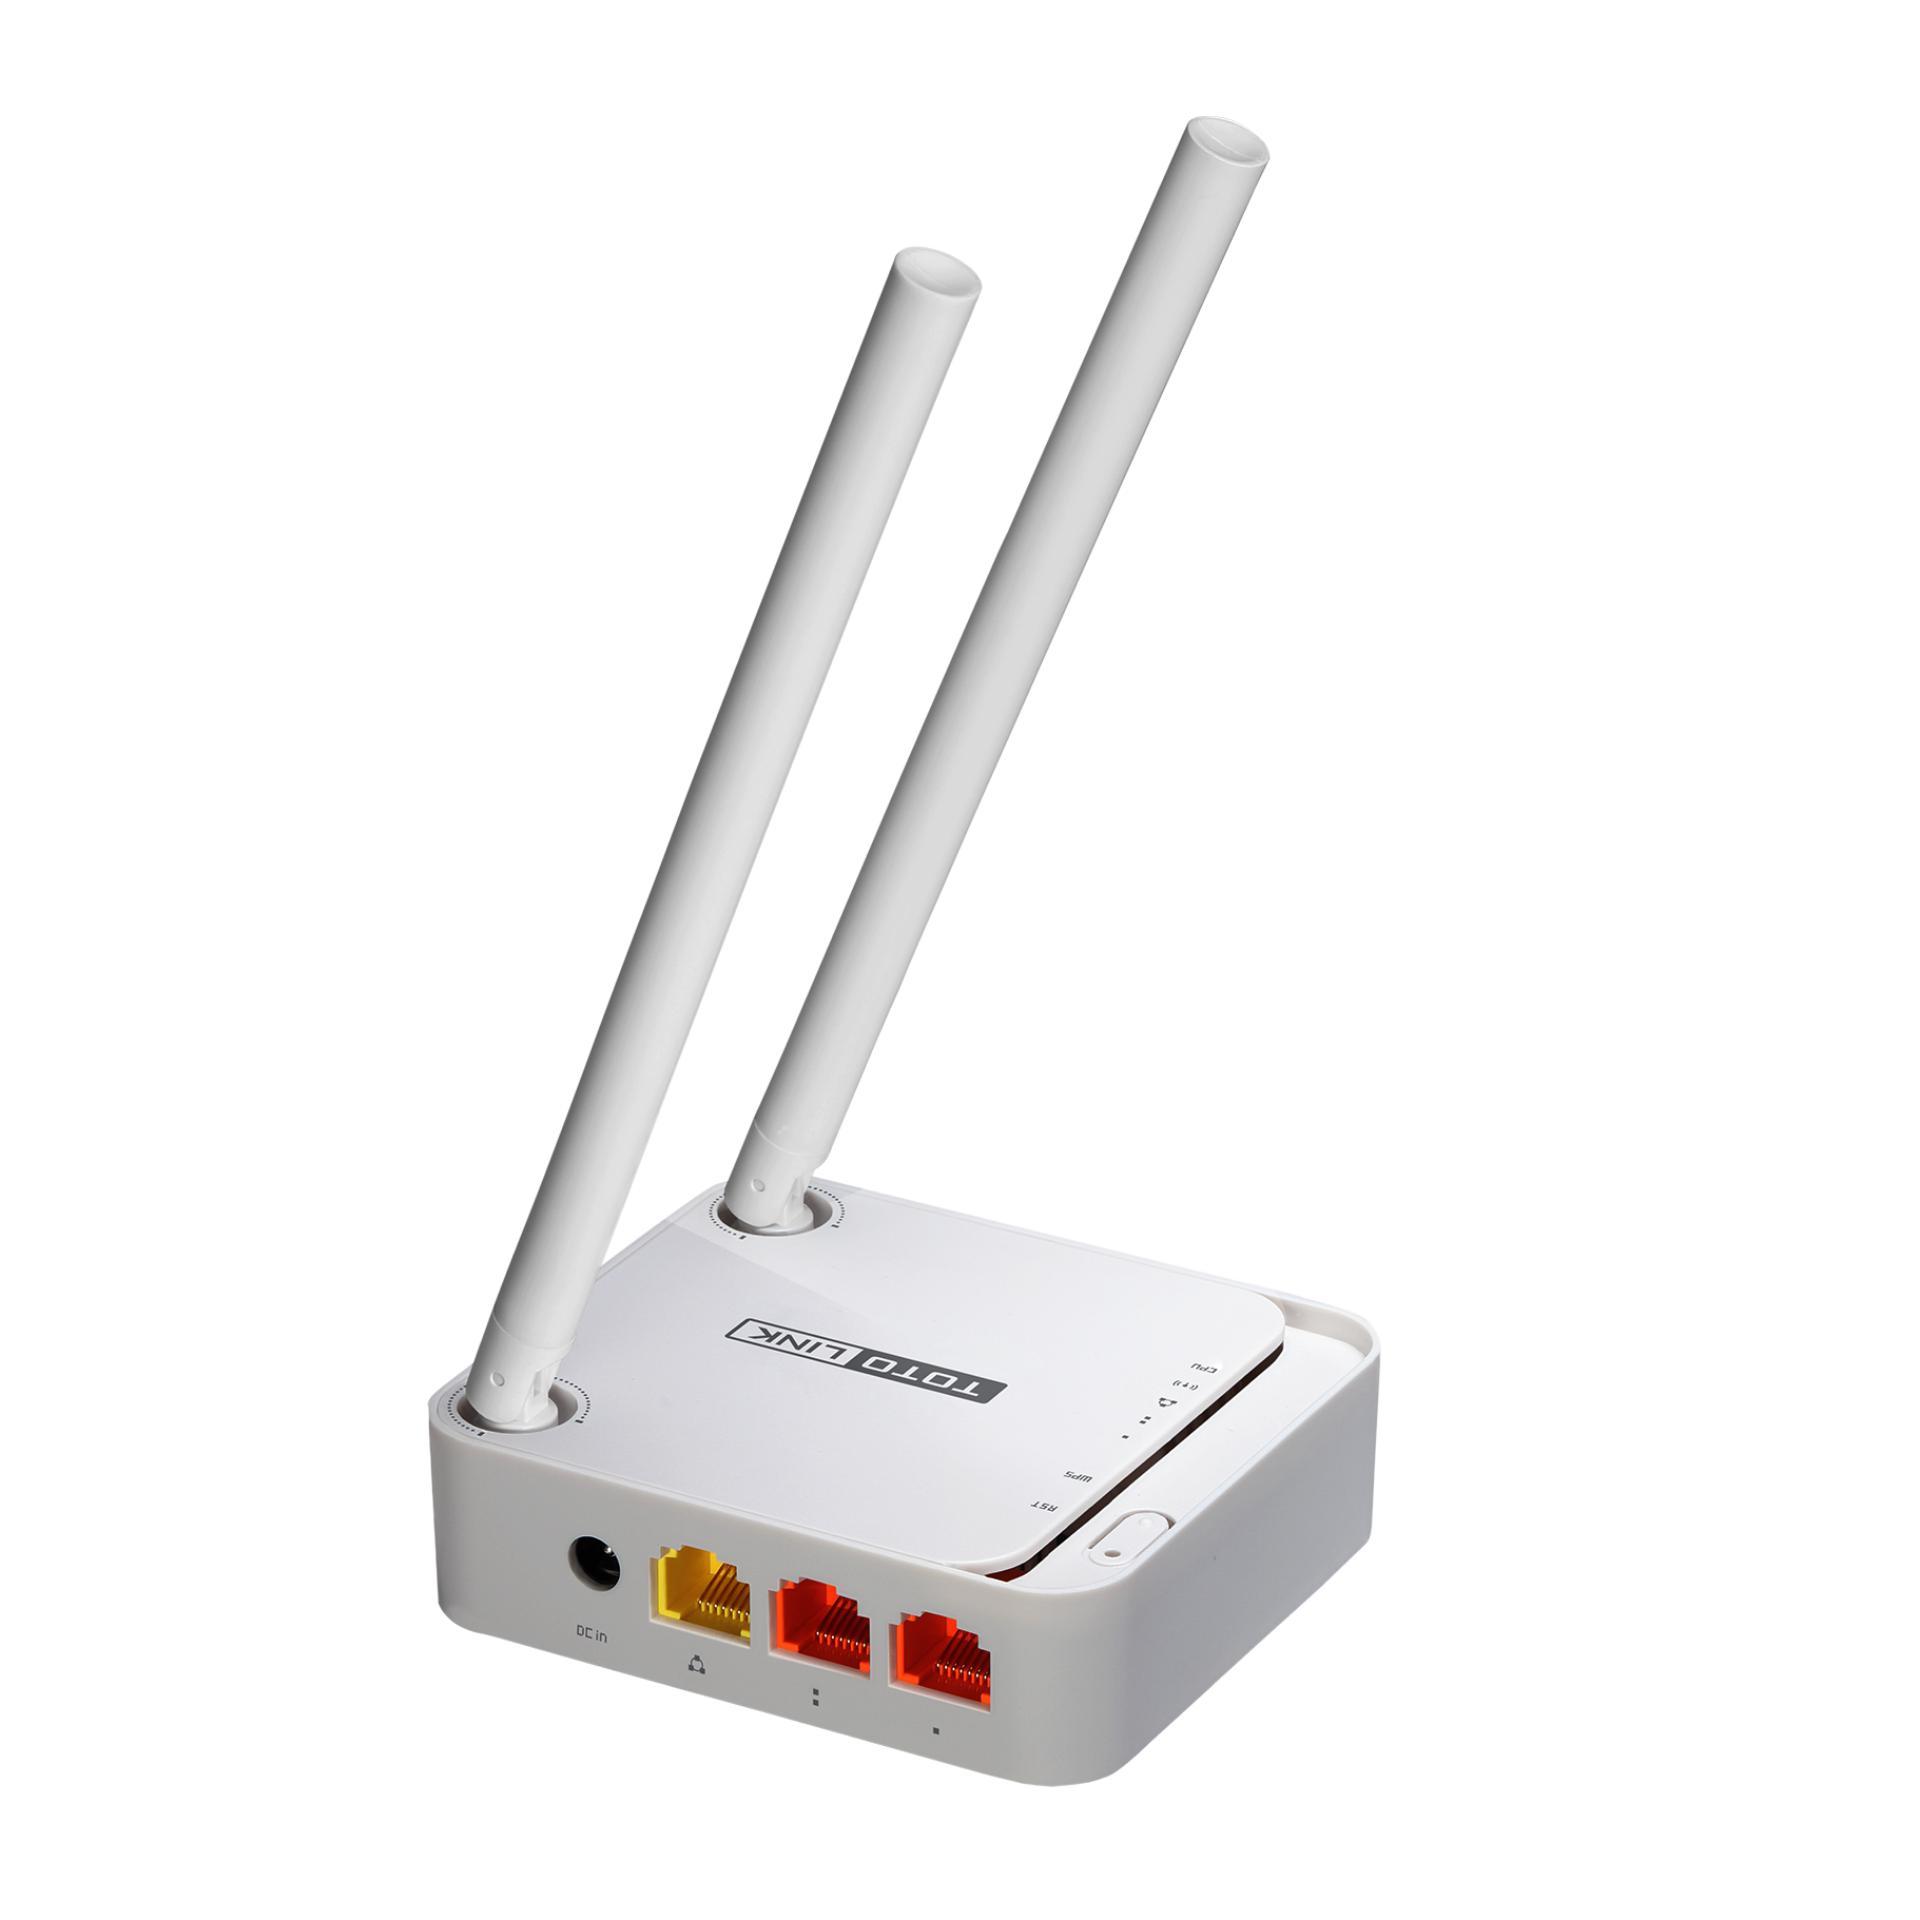 Mã Khuyến Mại Bộ Phat Wifi Totolink N200Re V3 Kich Song Wifi Totolink Ex200